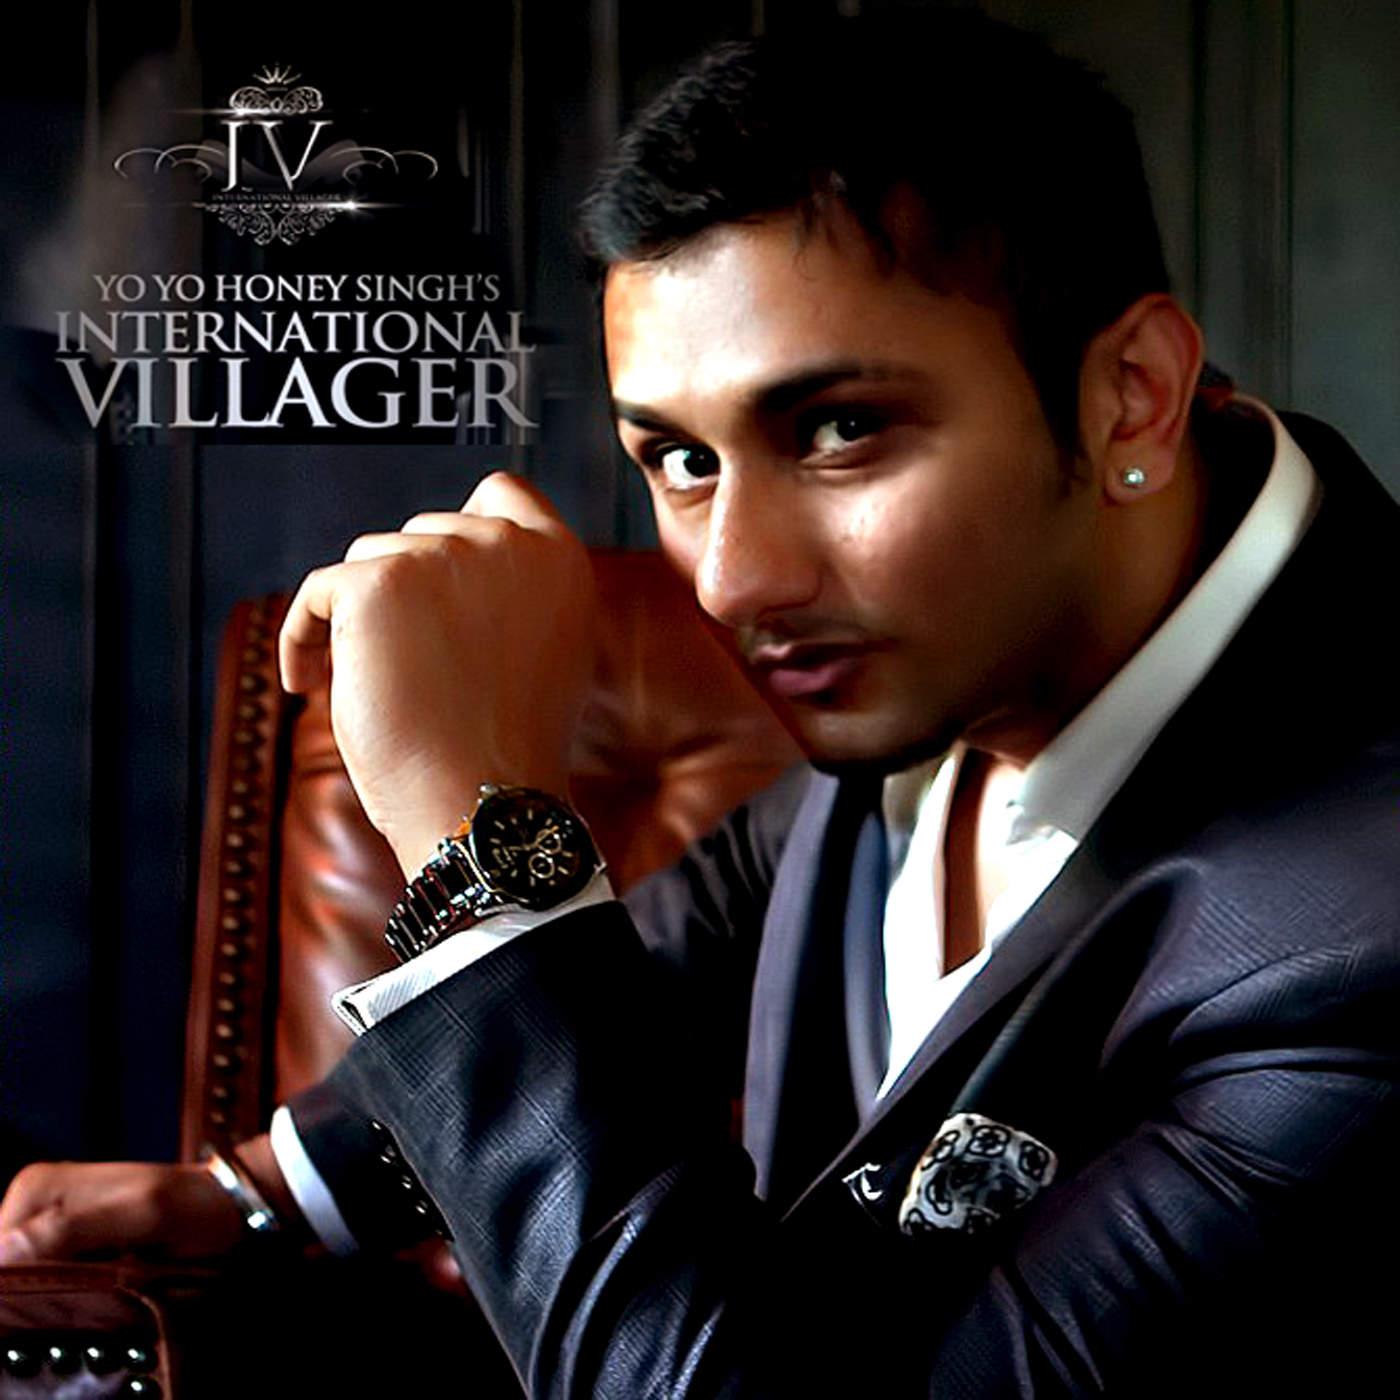 International villager mp3 download.